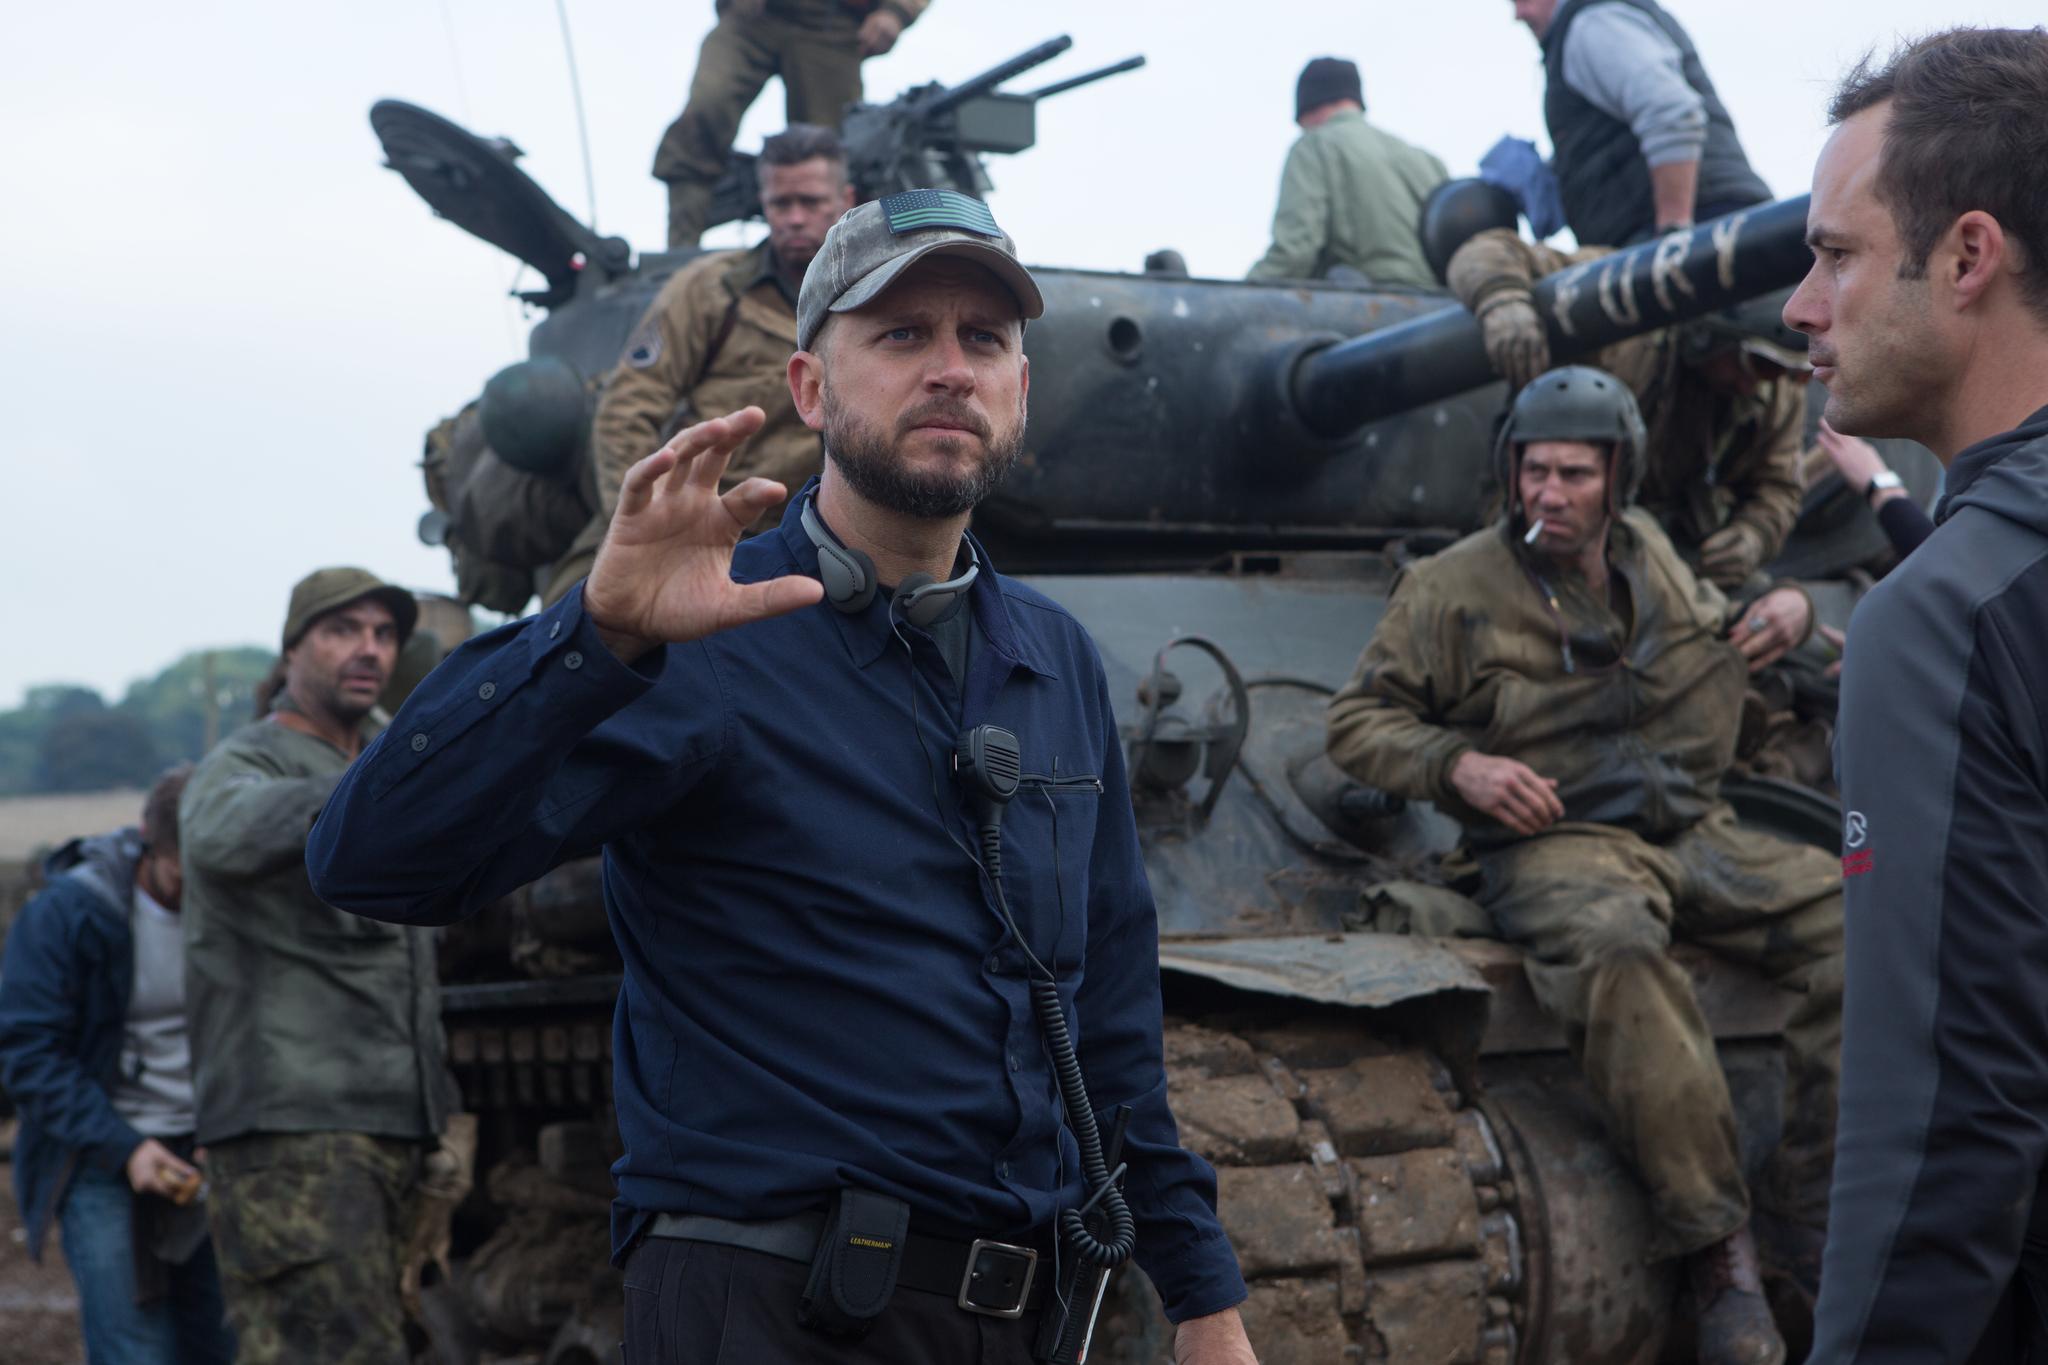 Brad Pitt, David Ayer and Jon Bernthal in Inirsis (2014)